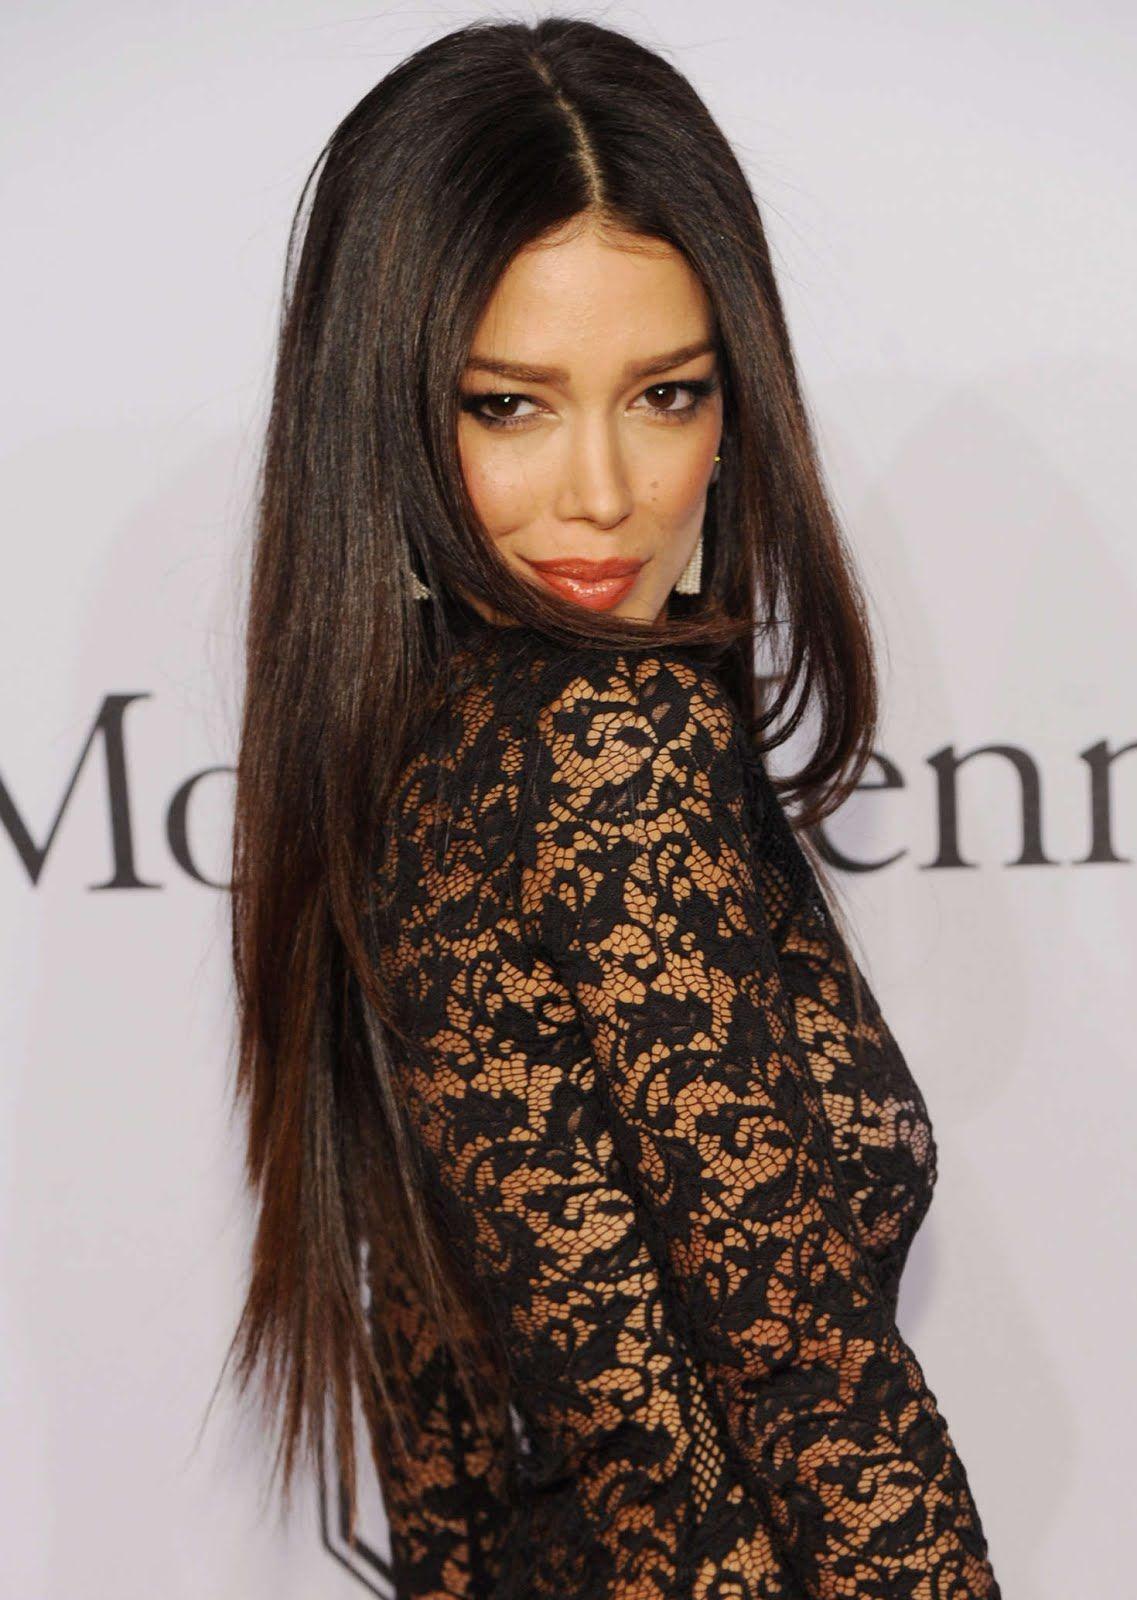 Hot and Sexy Persian Girls | Top 10 Most Beautiful Persian Women - HD Photos